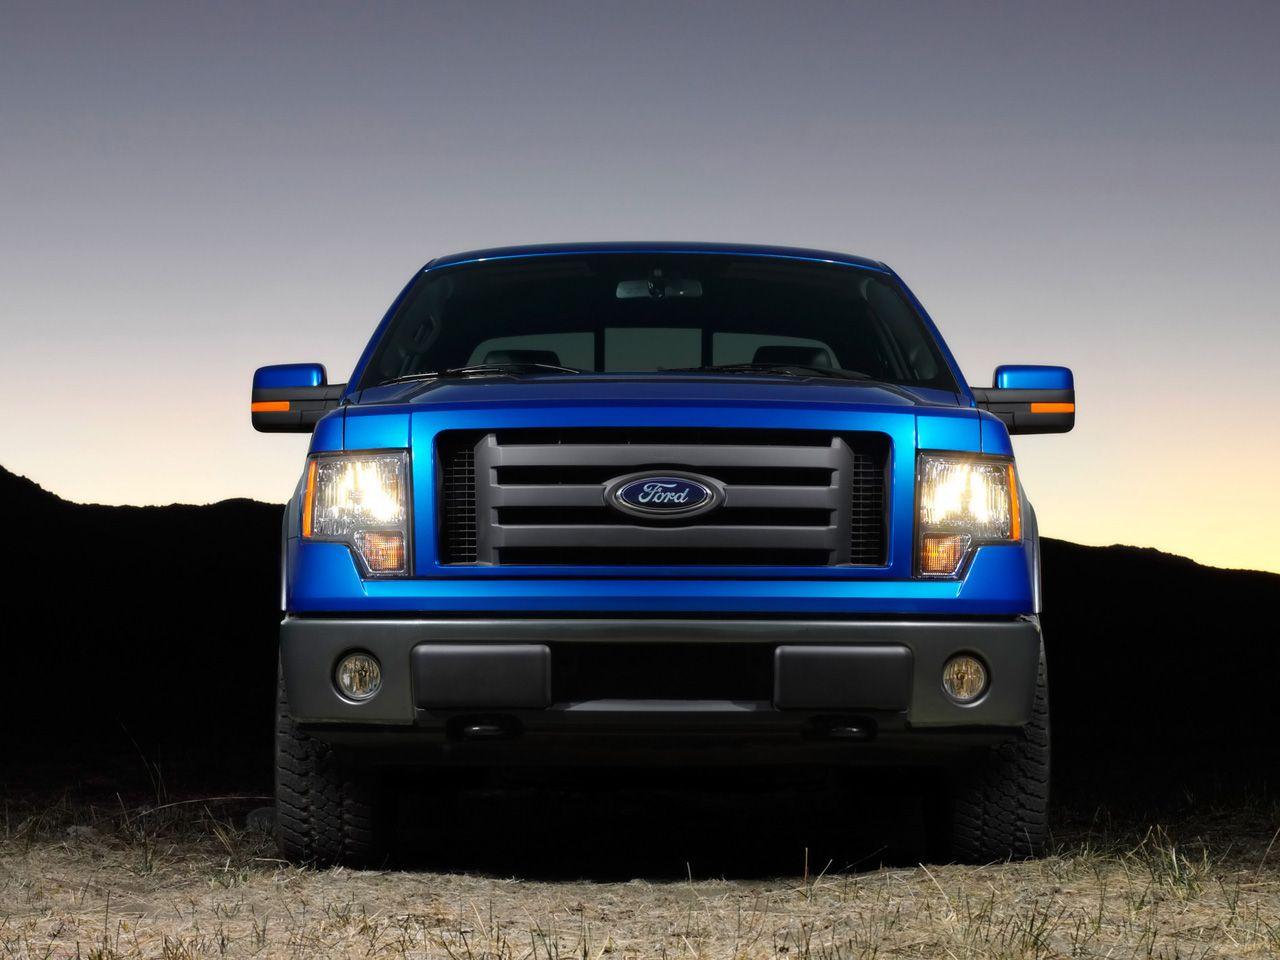 Ford Fx4 Wallpaper